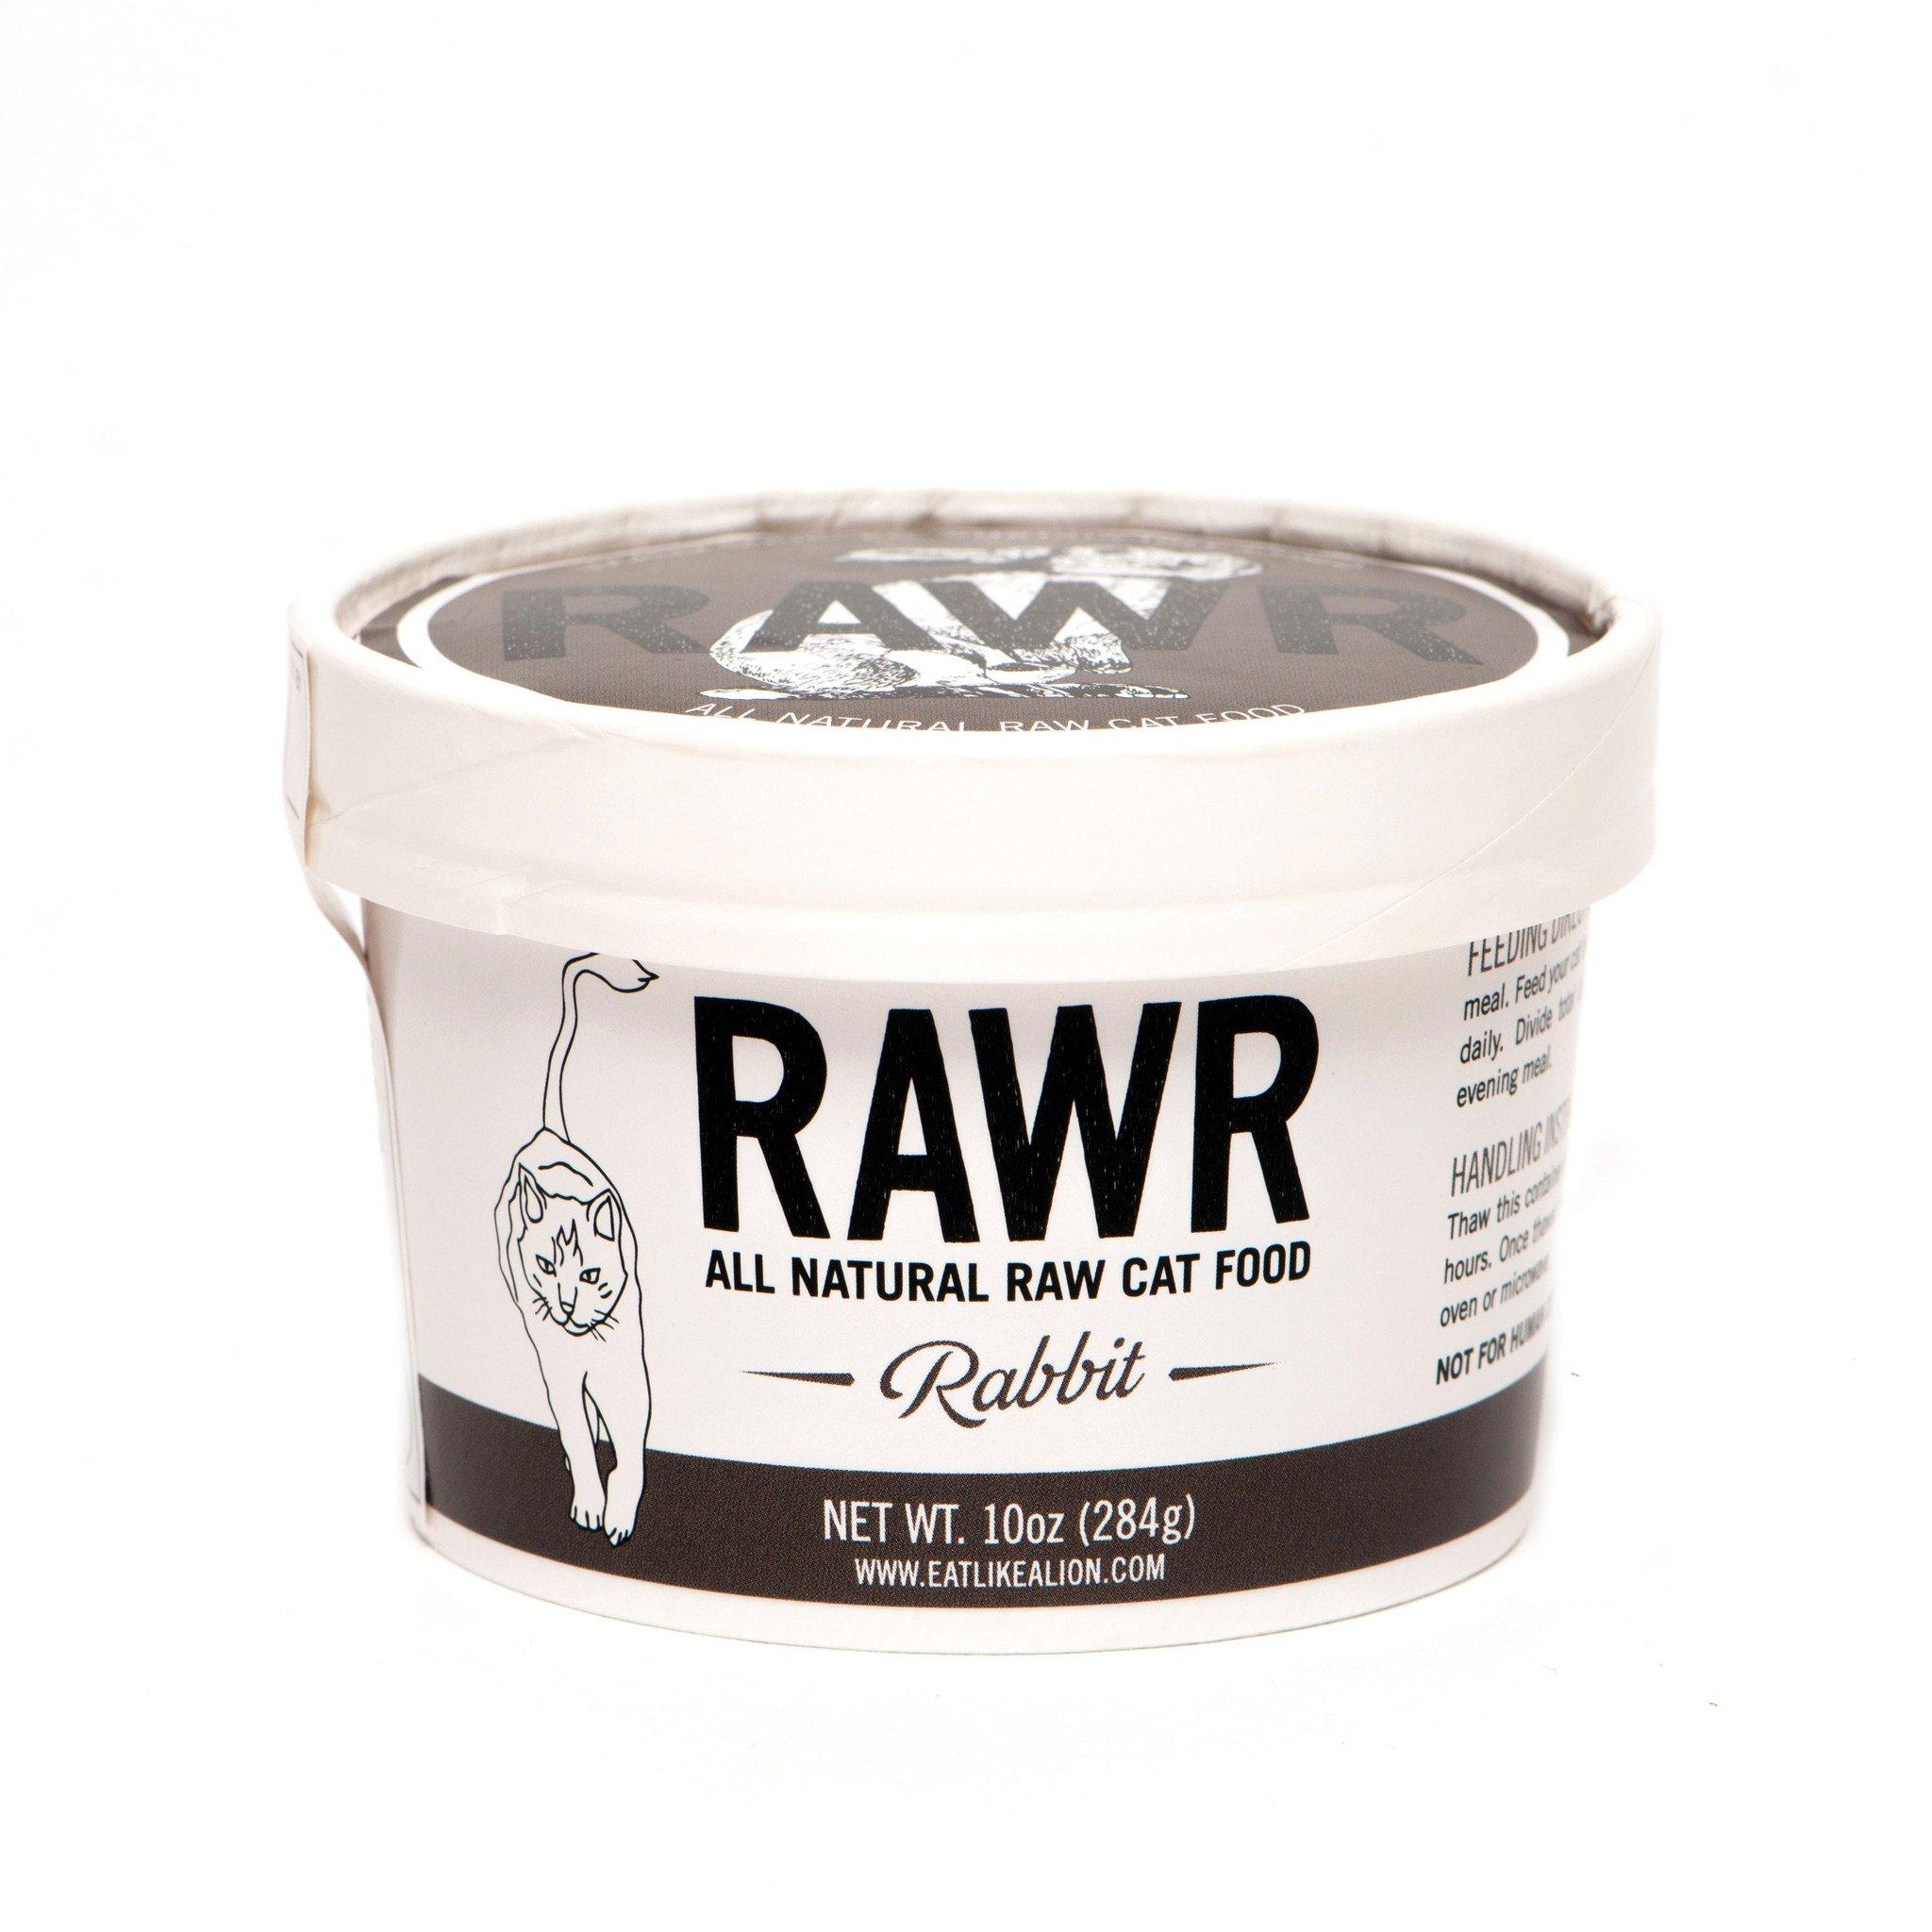 RAWR All Natural Rabbit Raw Frozen Cat Food, 8-oz